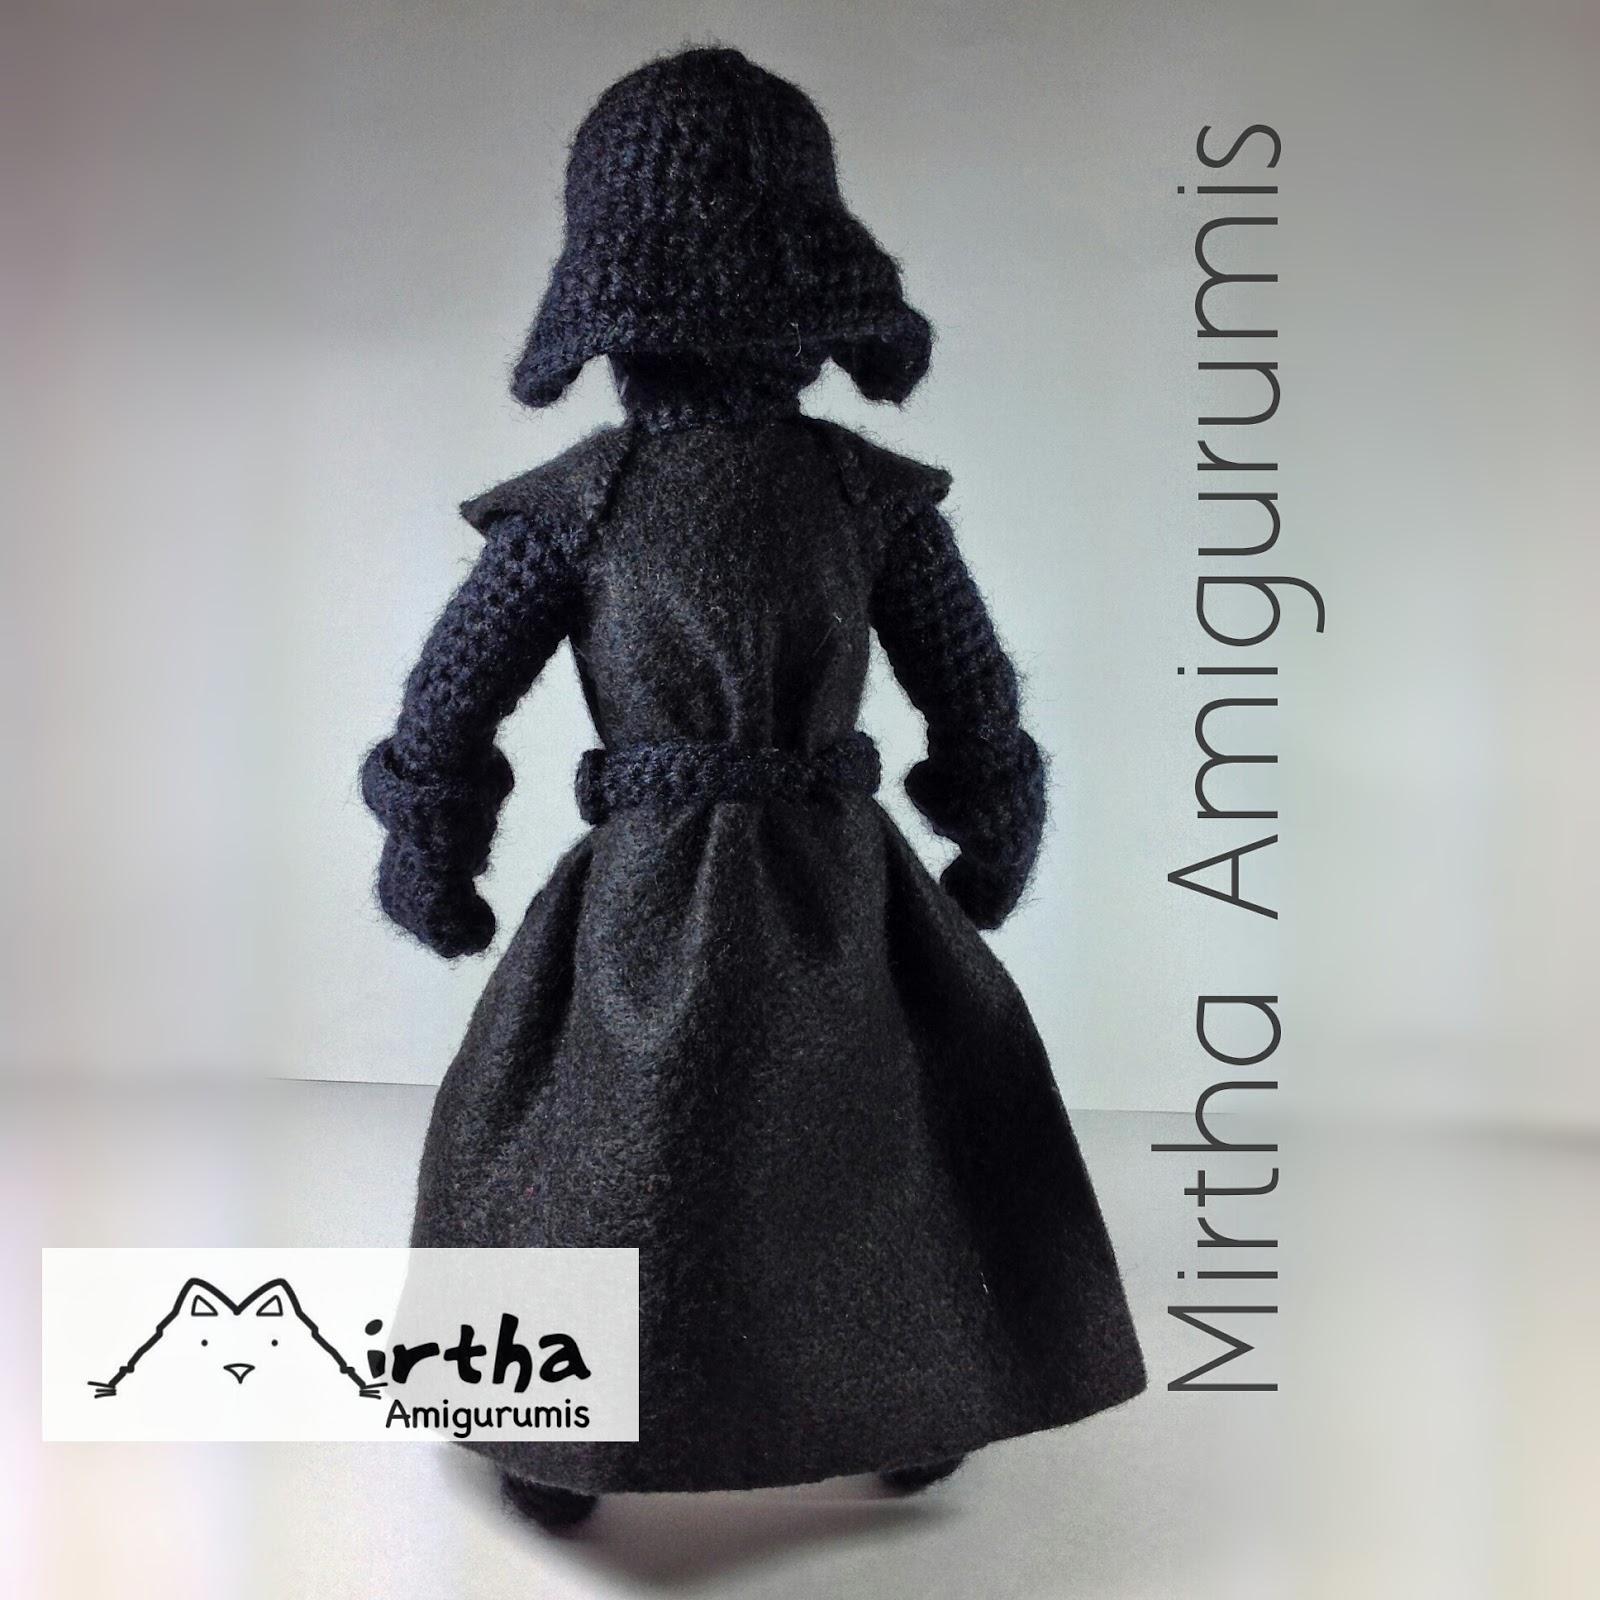 Amigurumi Snake Pattern Free : Mirtha Amigurumis: Darth Vader Amigurumi star wars (NOT ...